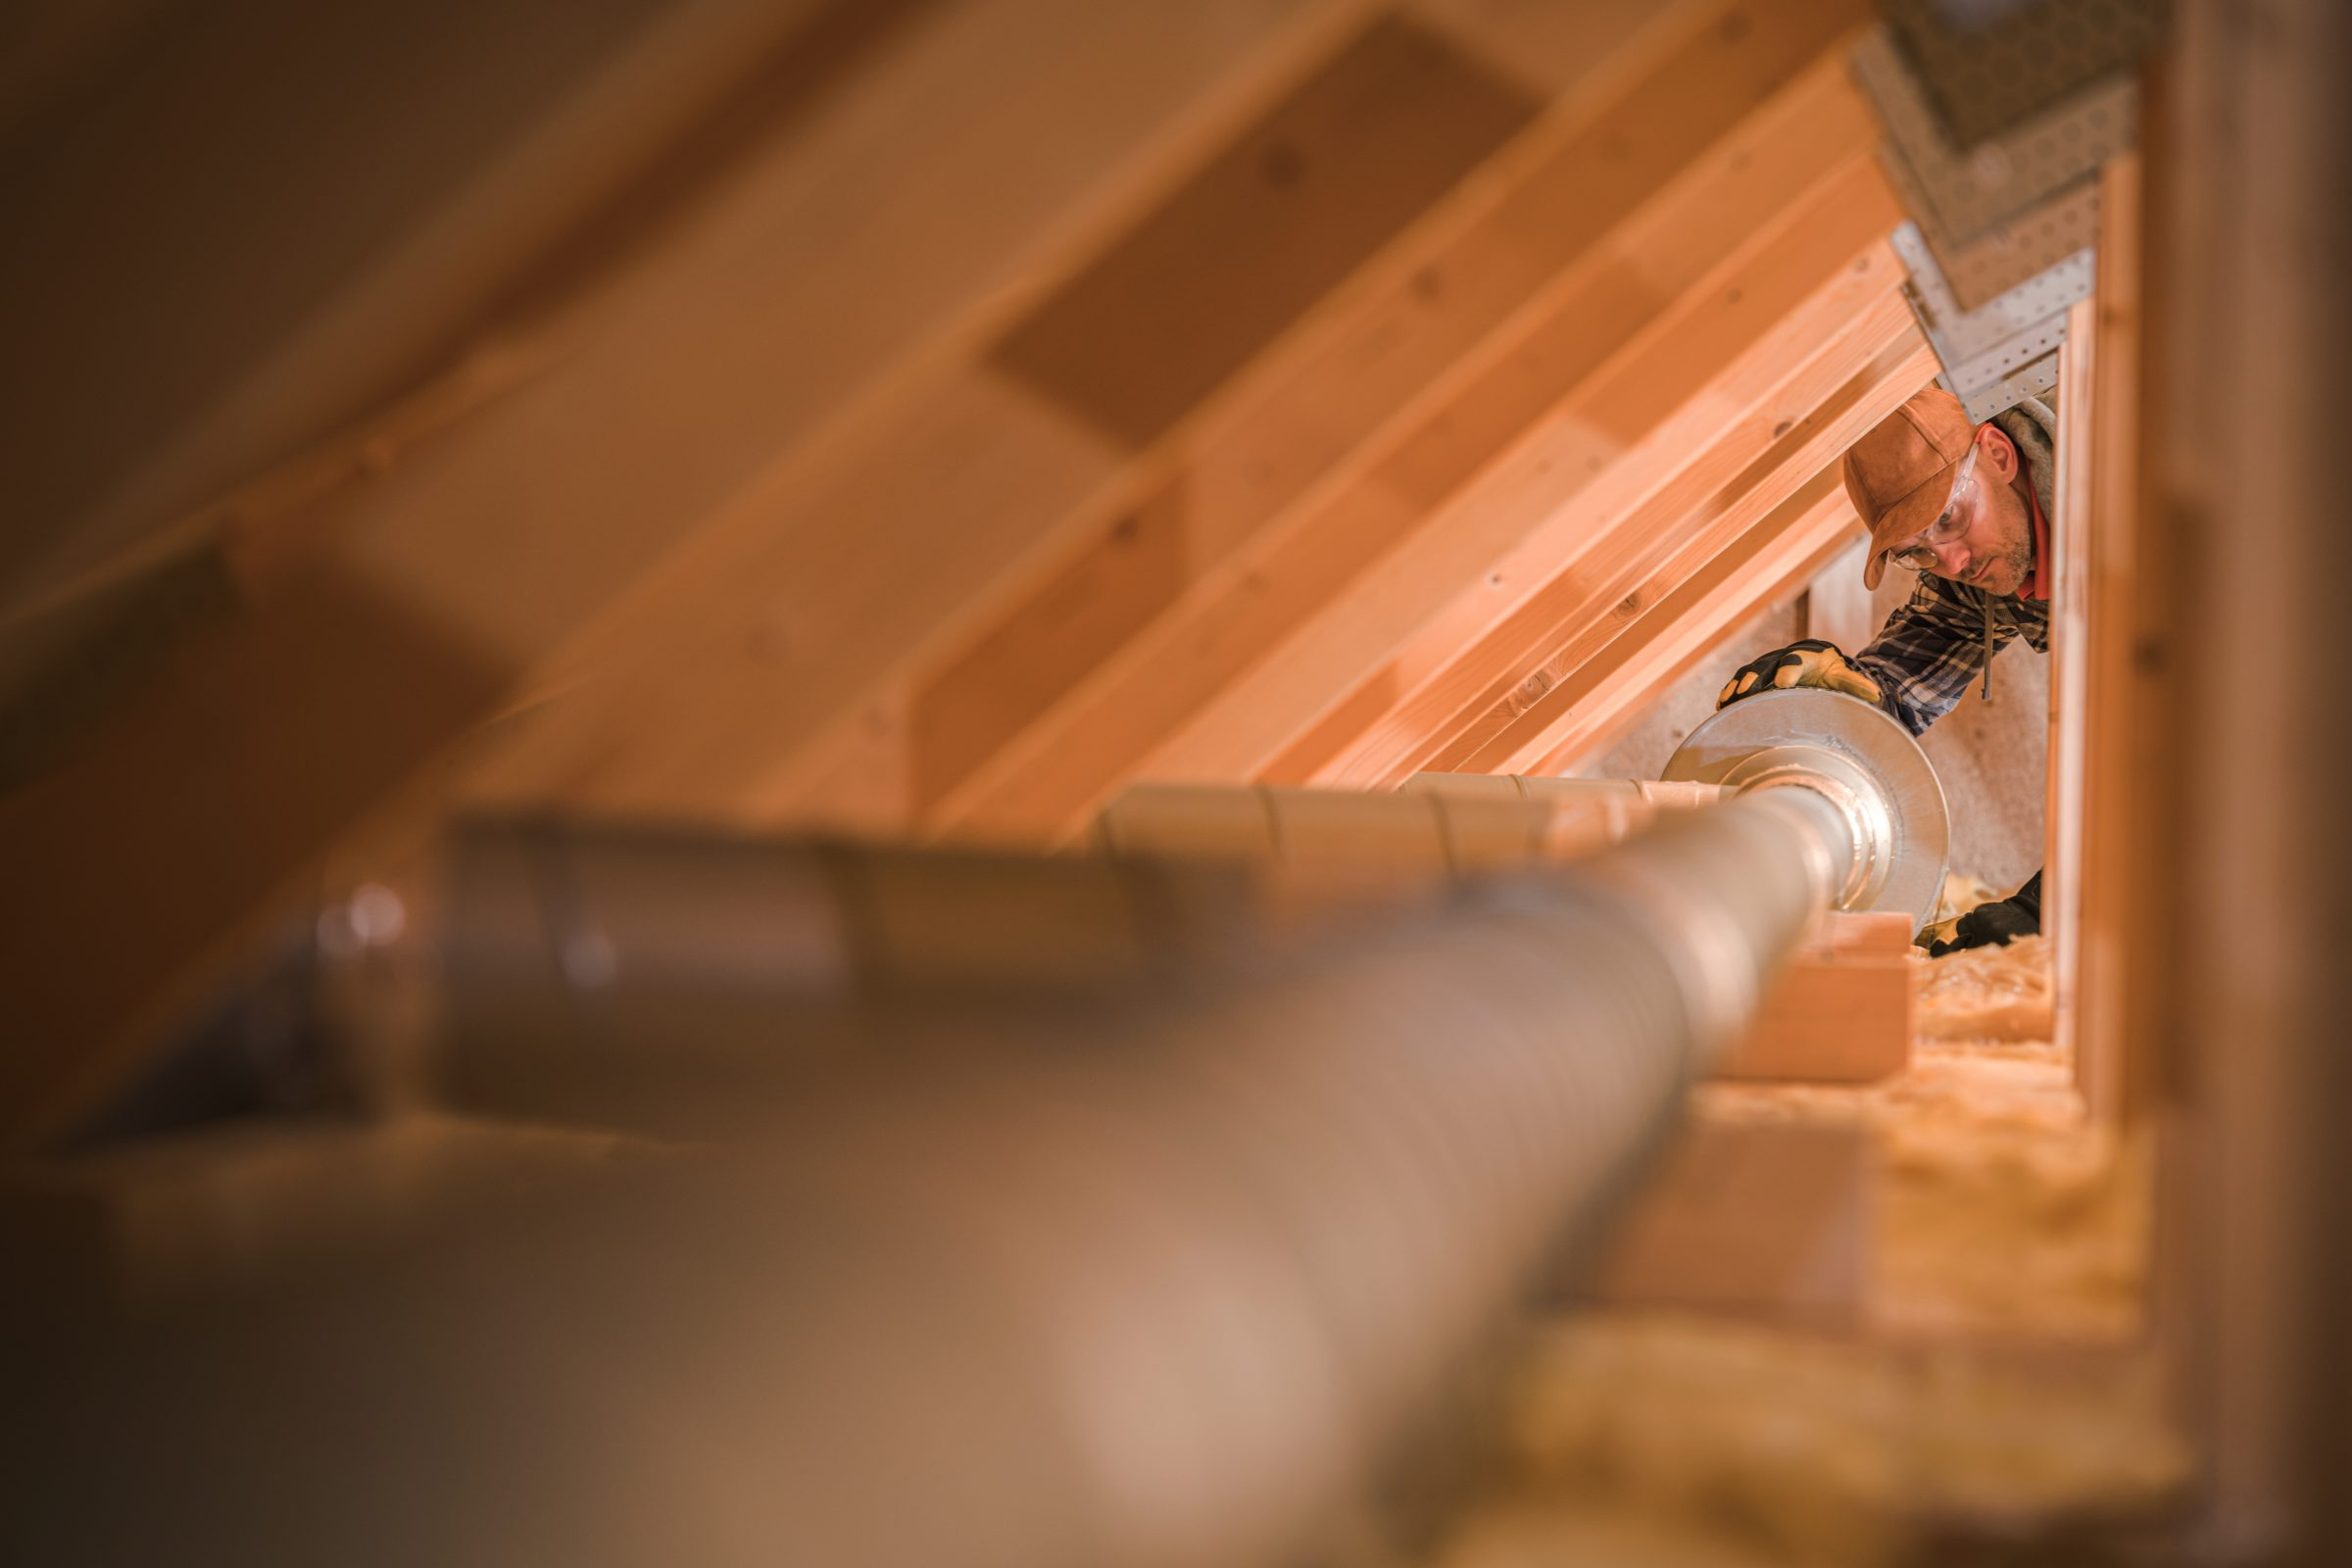 house air ventilation K8R52LC